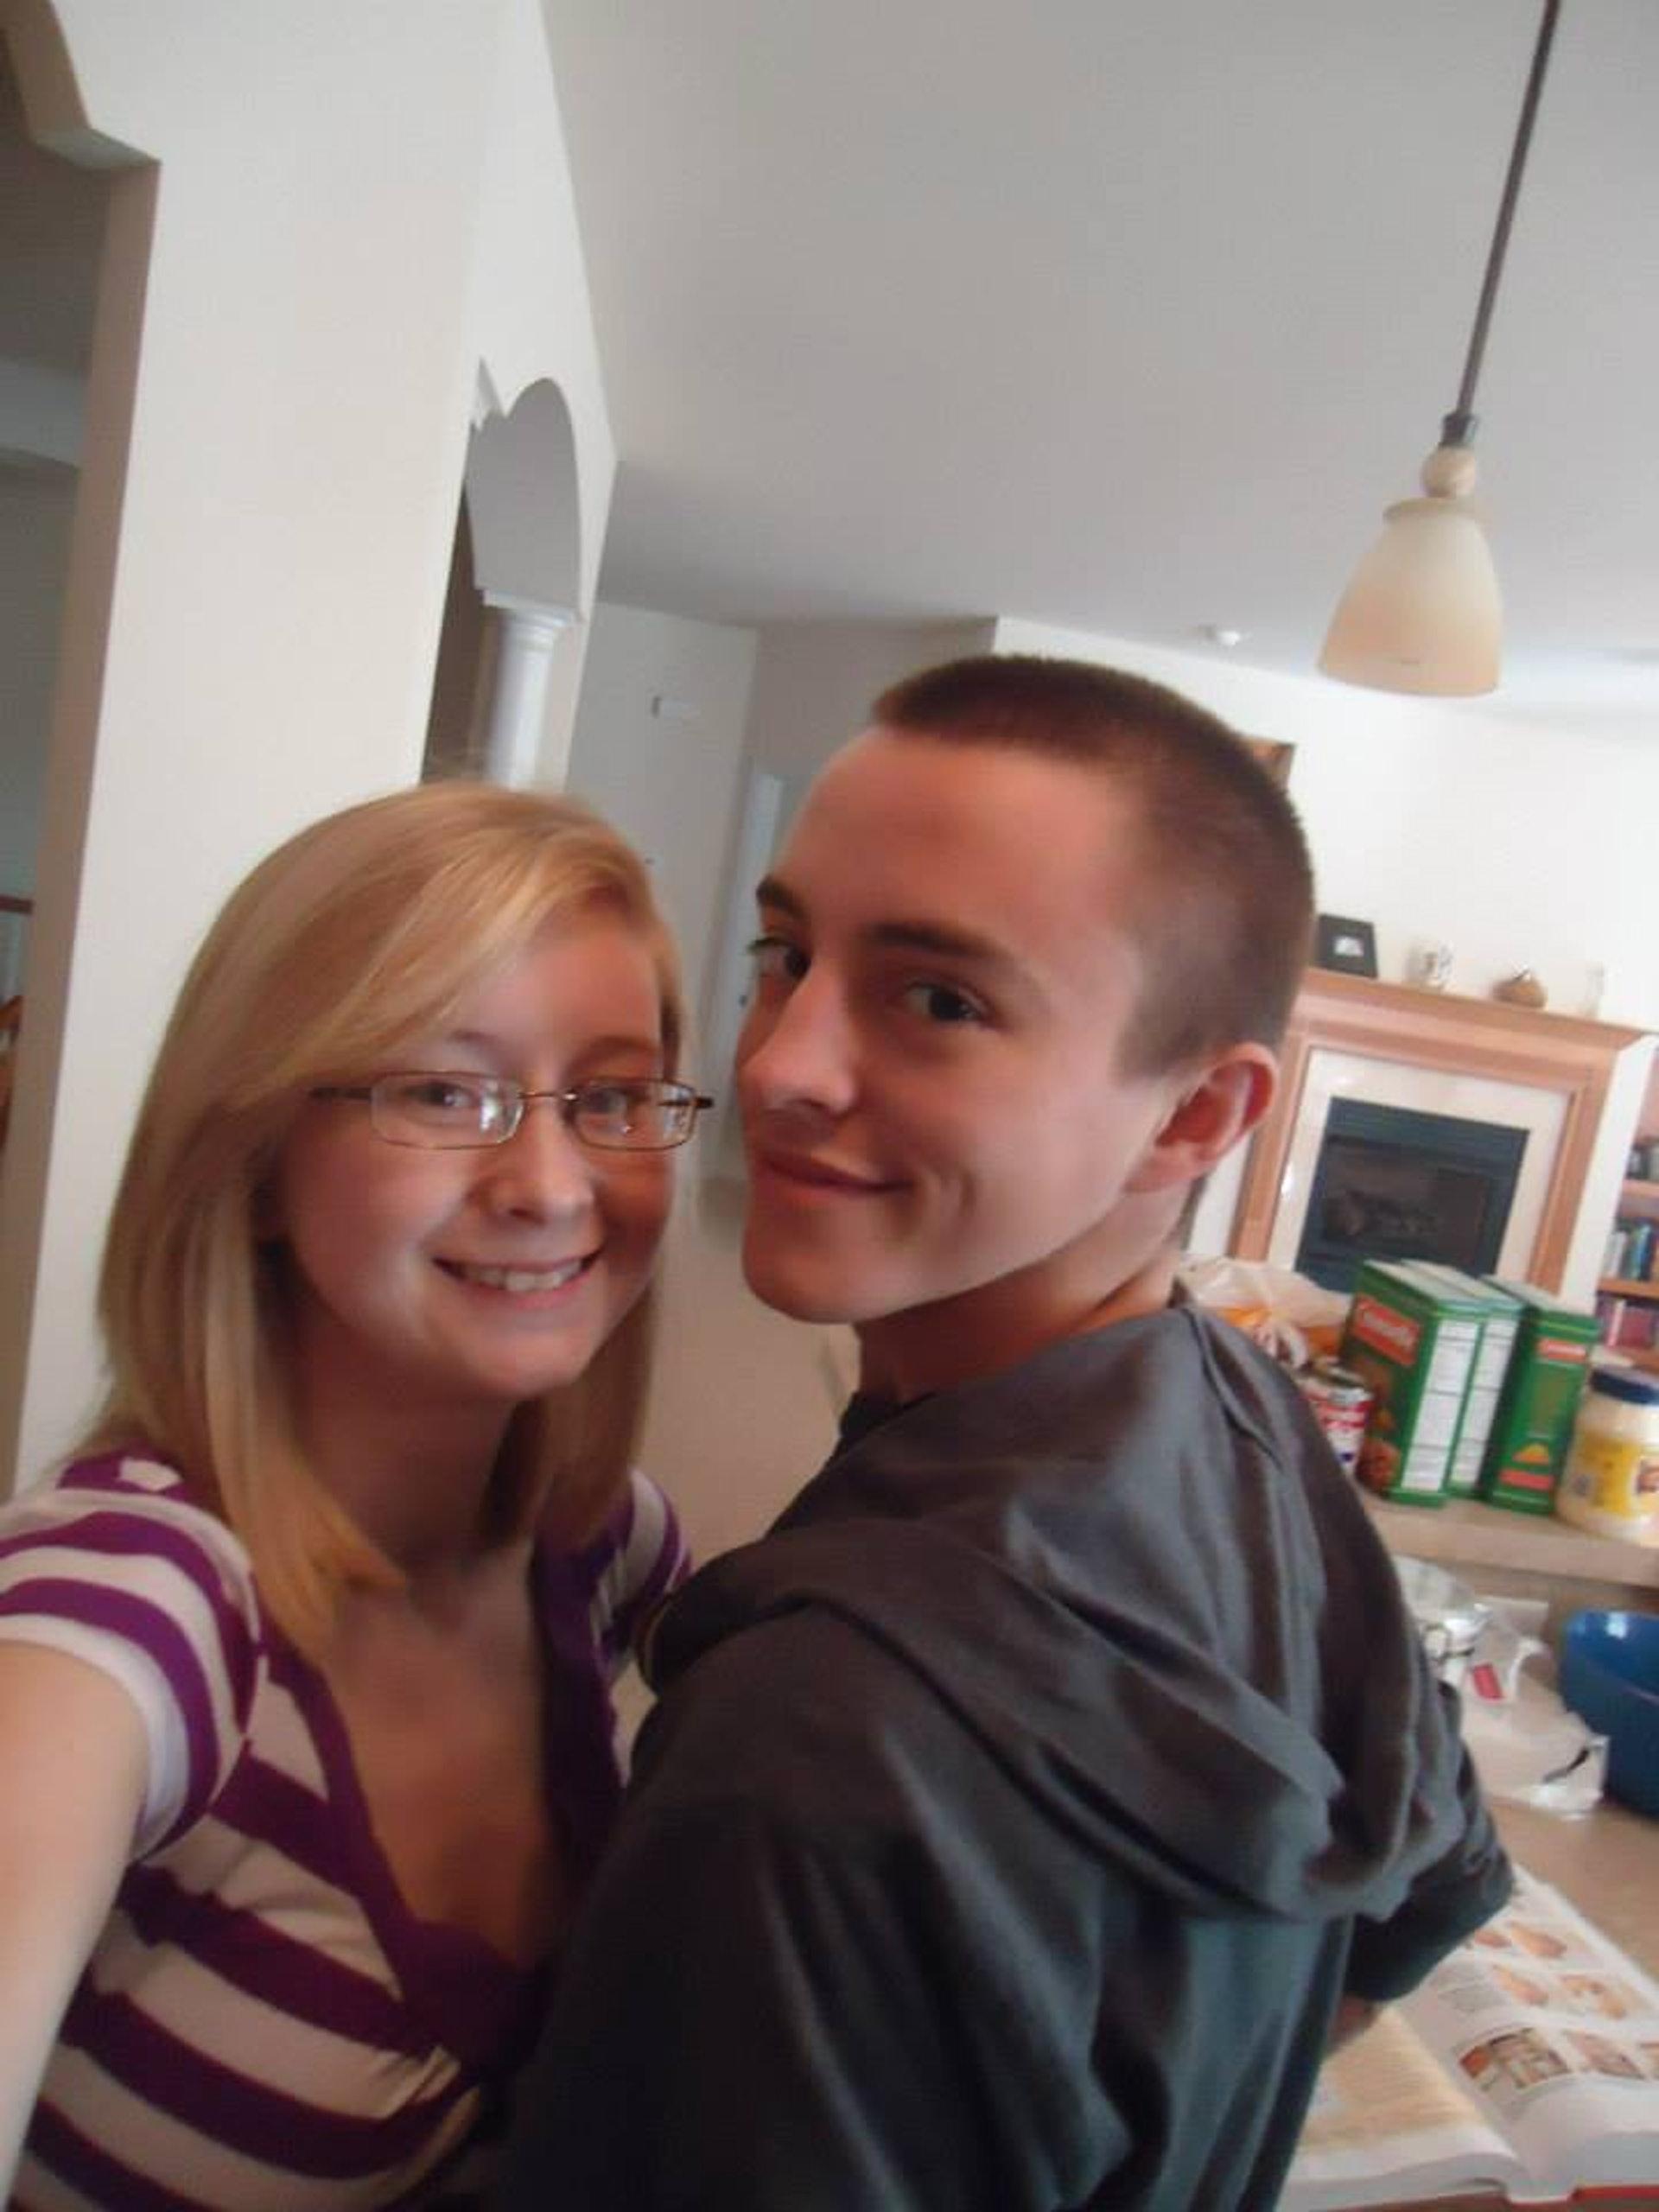 凱蒂(Katie Prager)和道爾頓(Dalton Prager)均患上「囊腫性纖維症」,兩人亦曾有過一段開心又健康的時光。(facebook「Dalton and Katie Prager's Transplant Page」圖片)